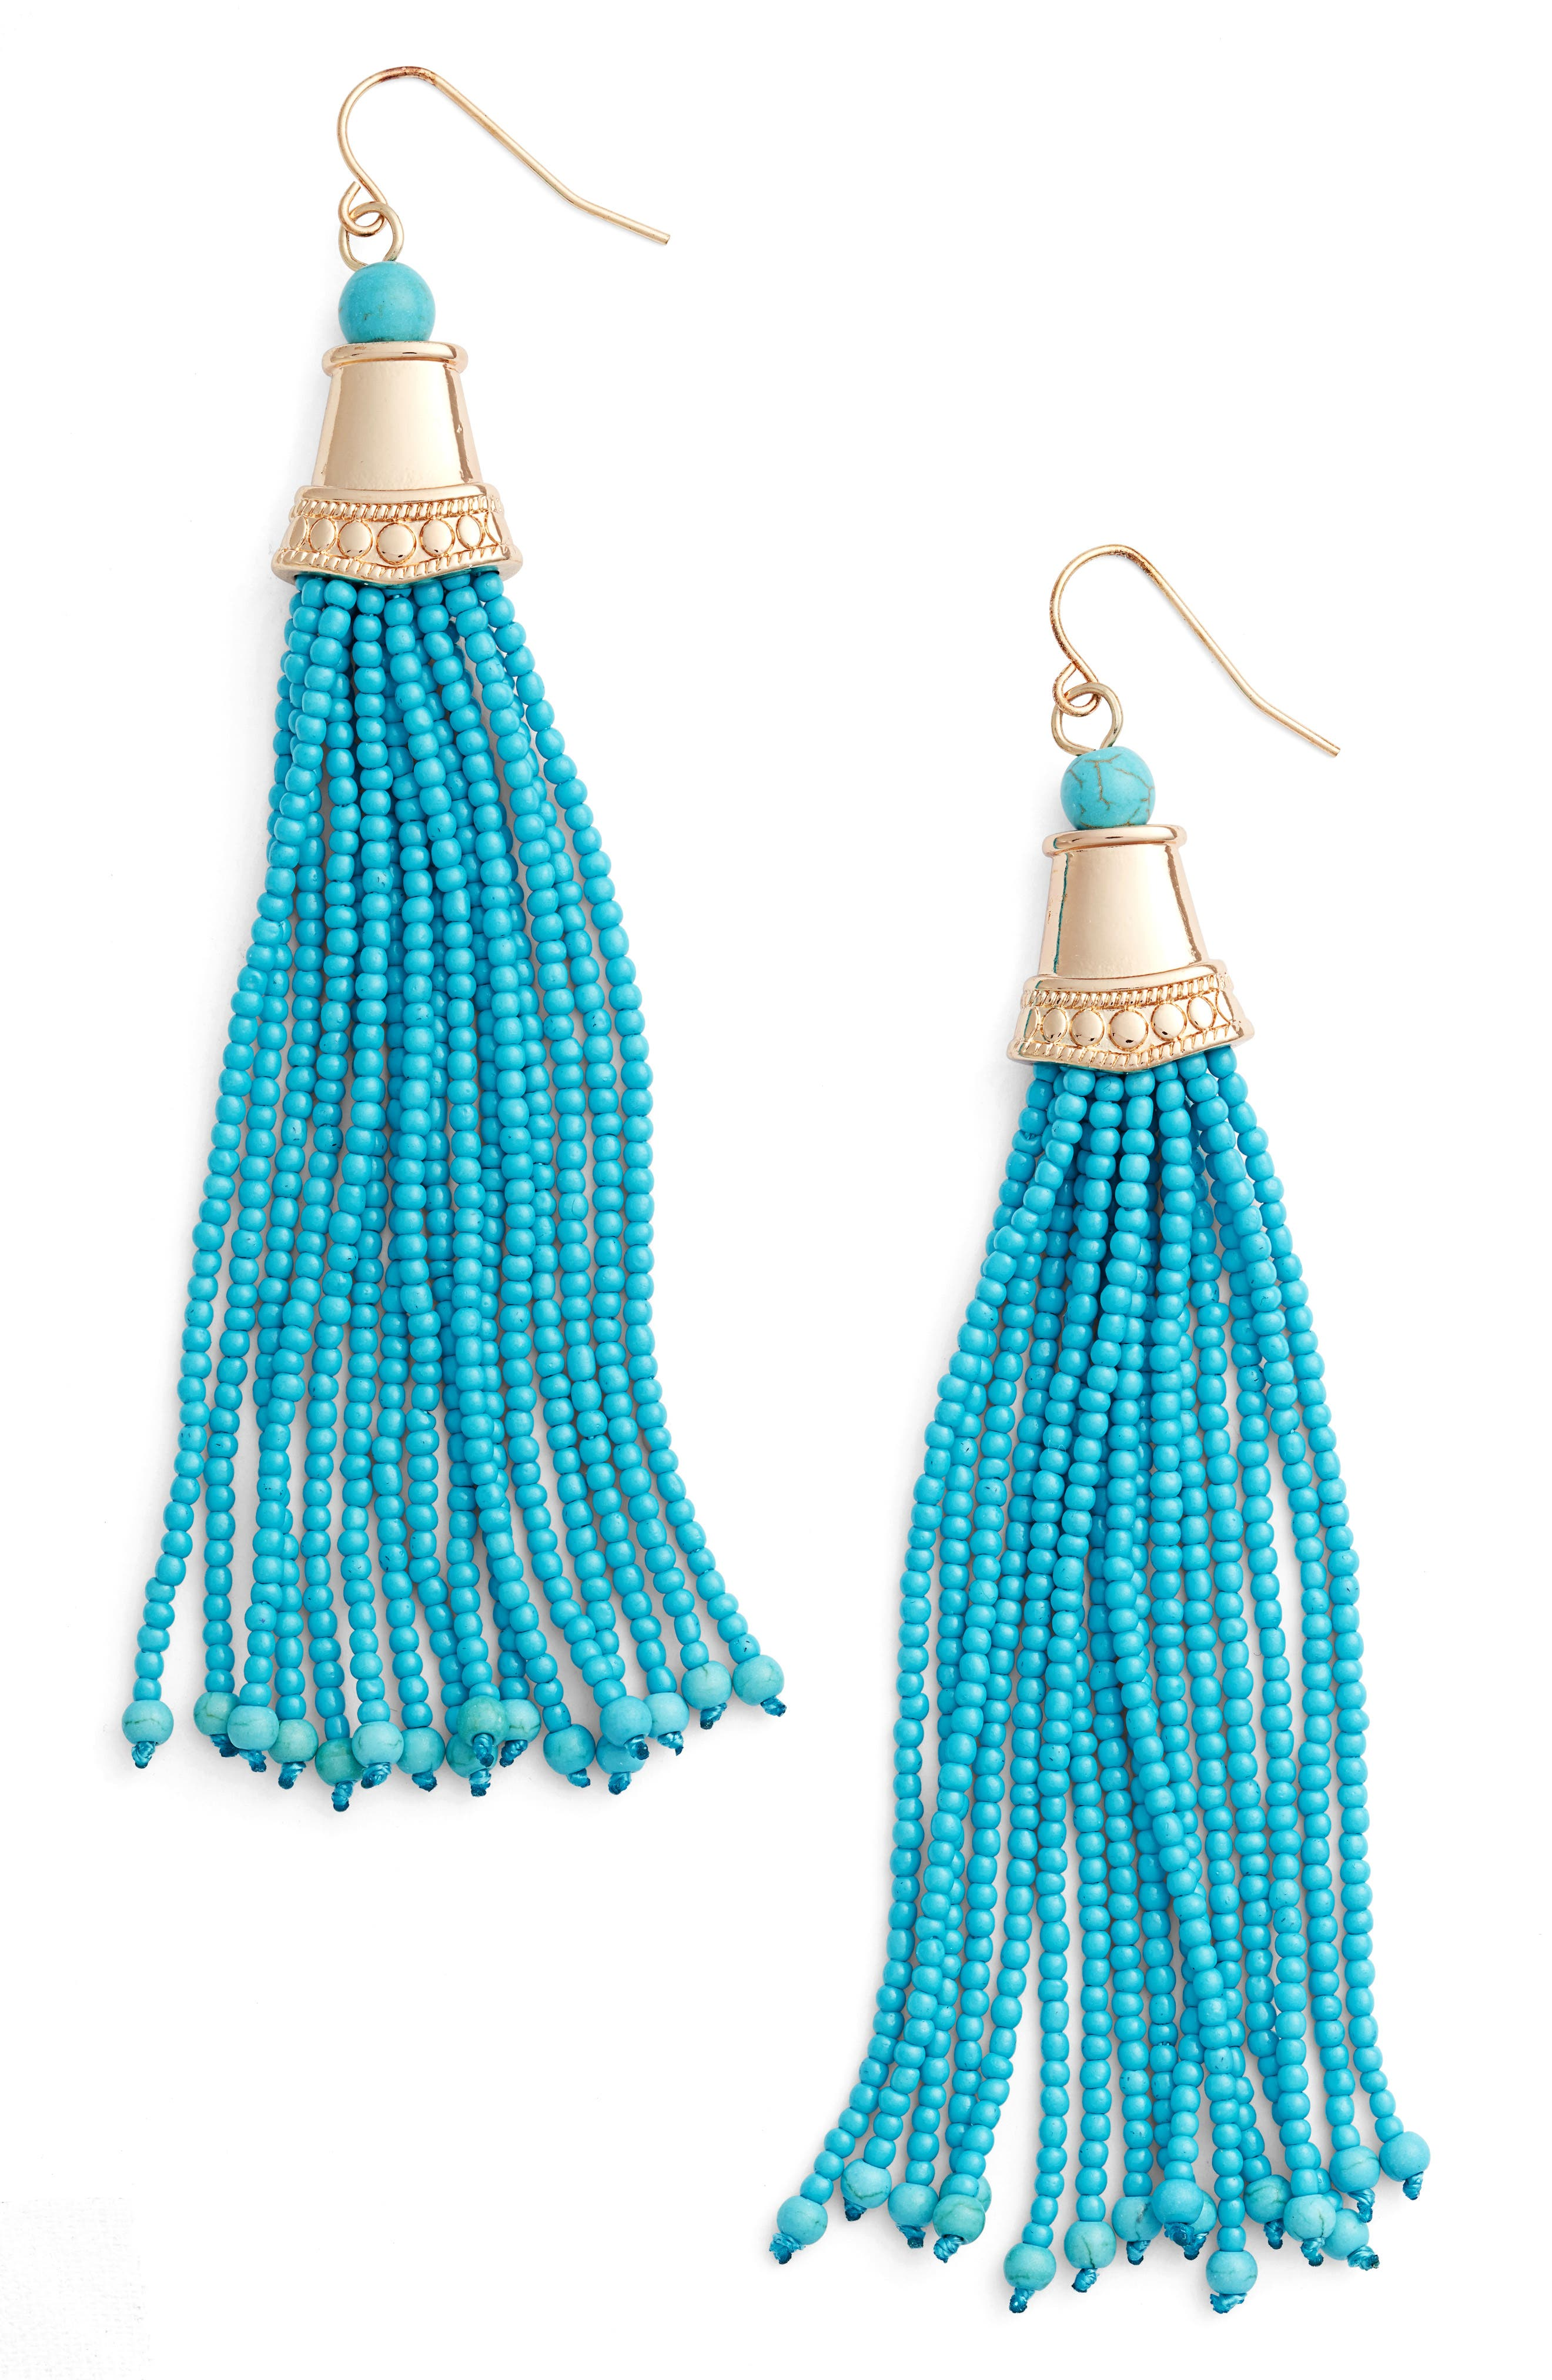 Beaded Tassel Earrings,                             Main thumbnail 1, color,                             TURQUOISE